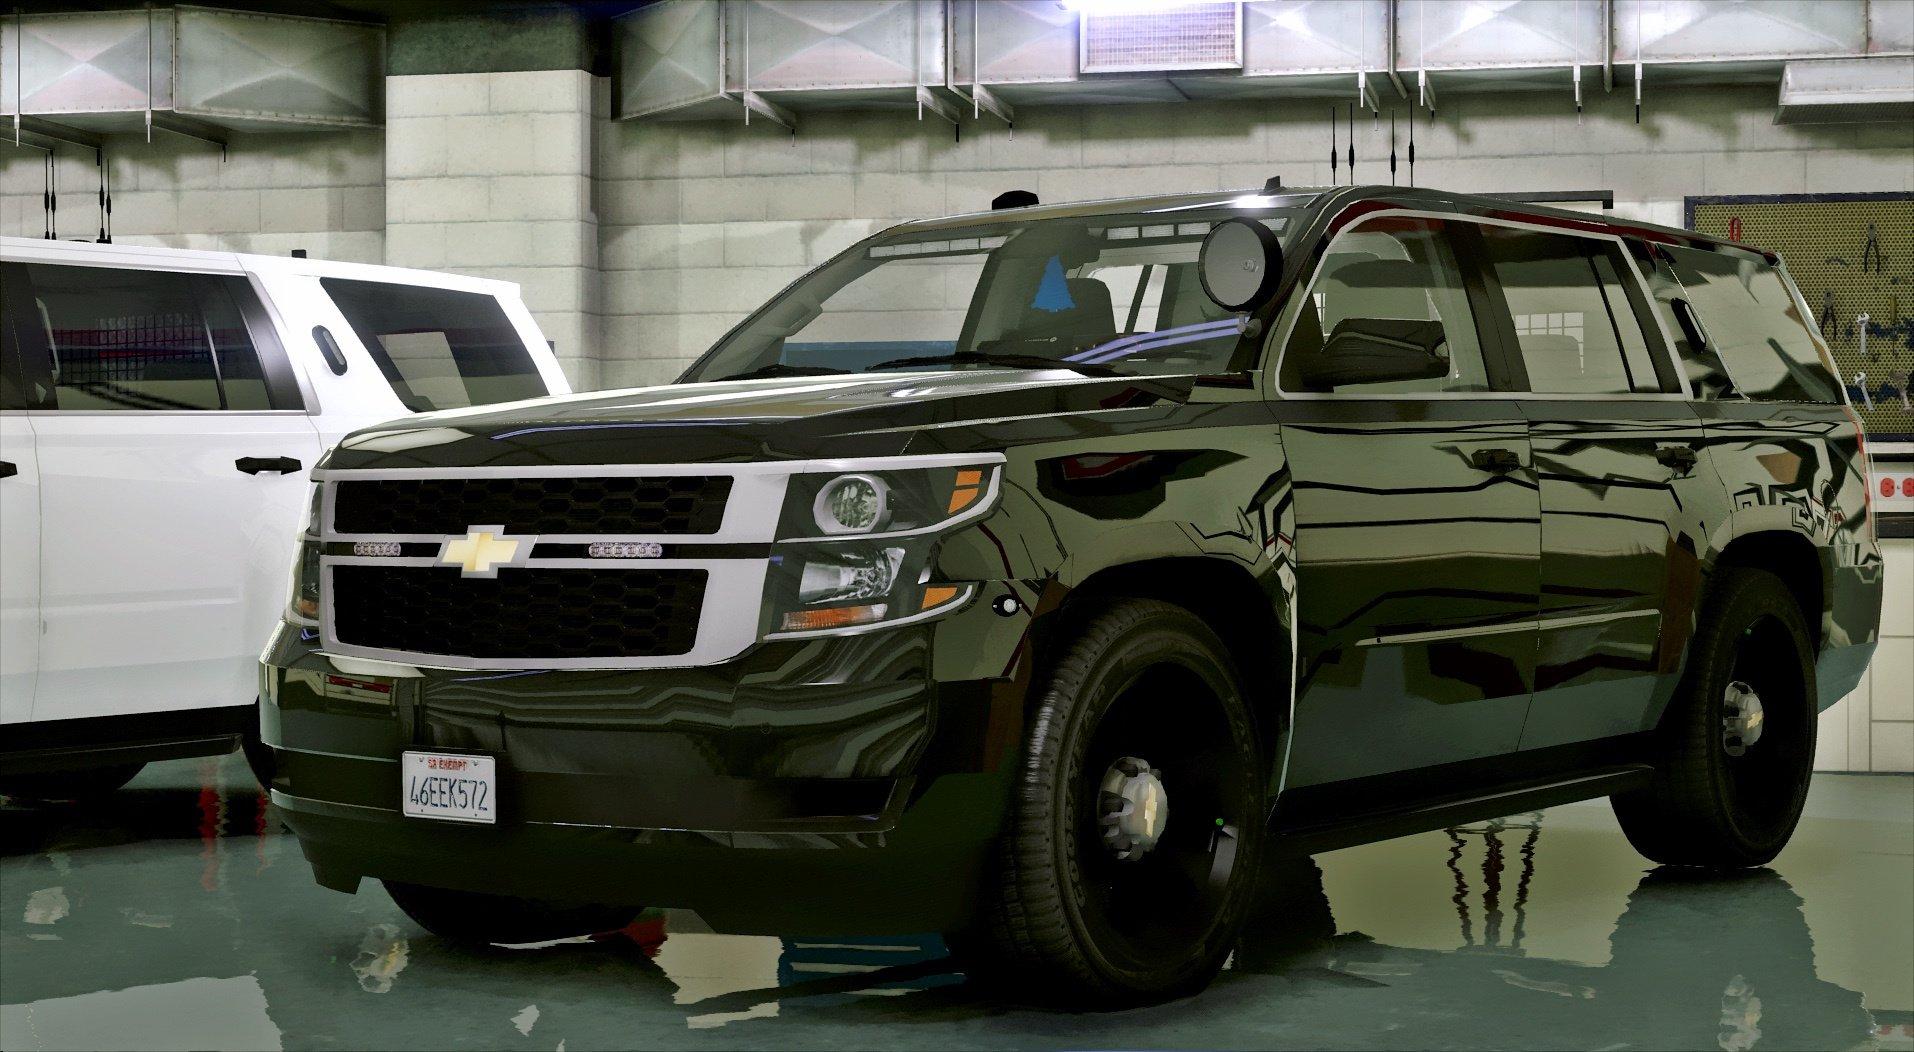 2015 Unmarked Police Tahoe [ELS] - GTA5-Mods.com